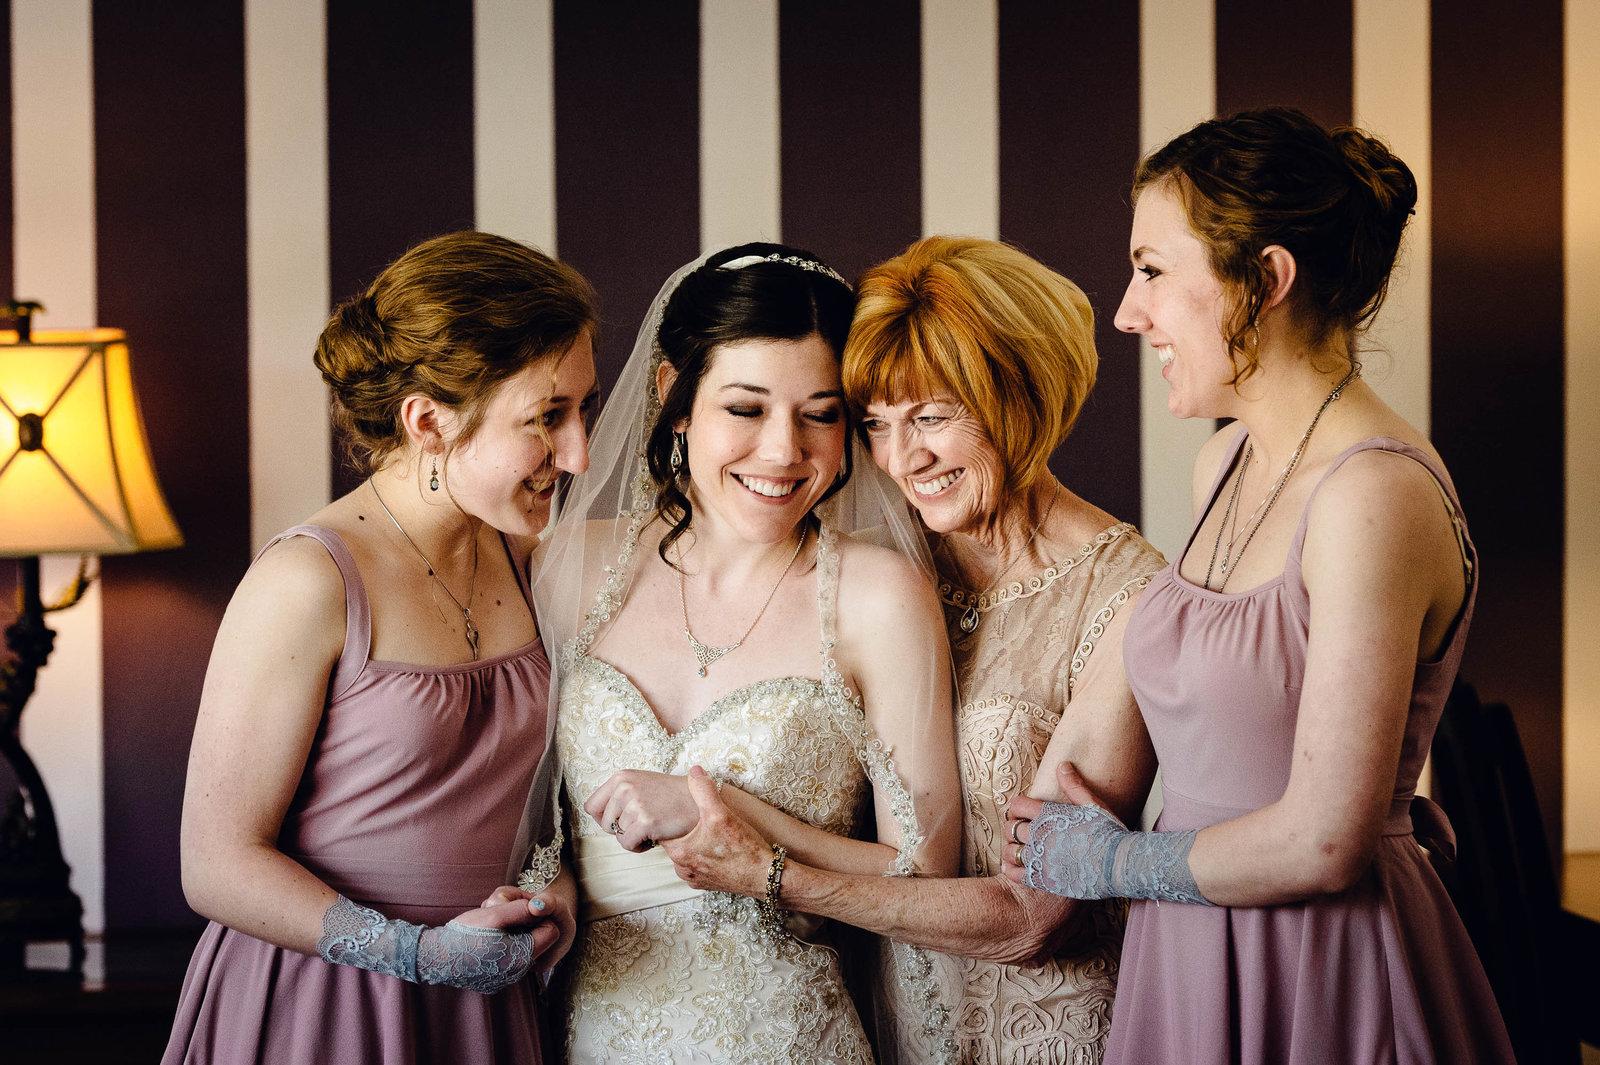 182-El-paso-wedding-photographer-El Paso Wedding Photographer_M58